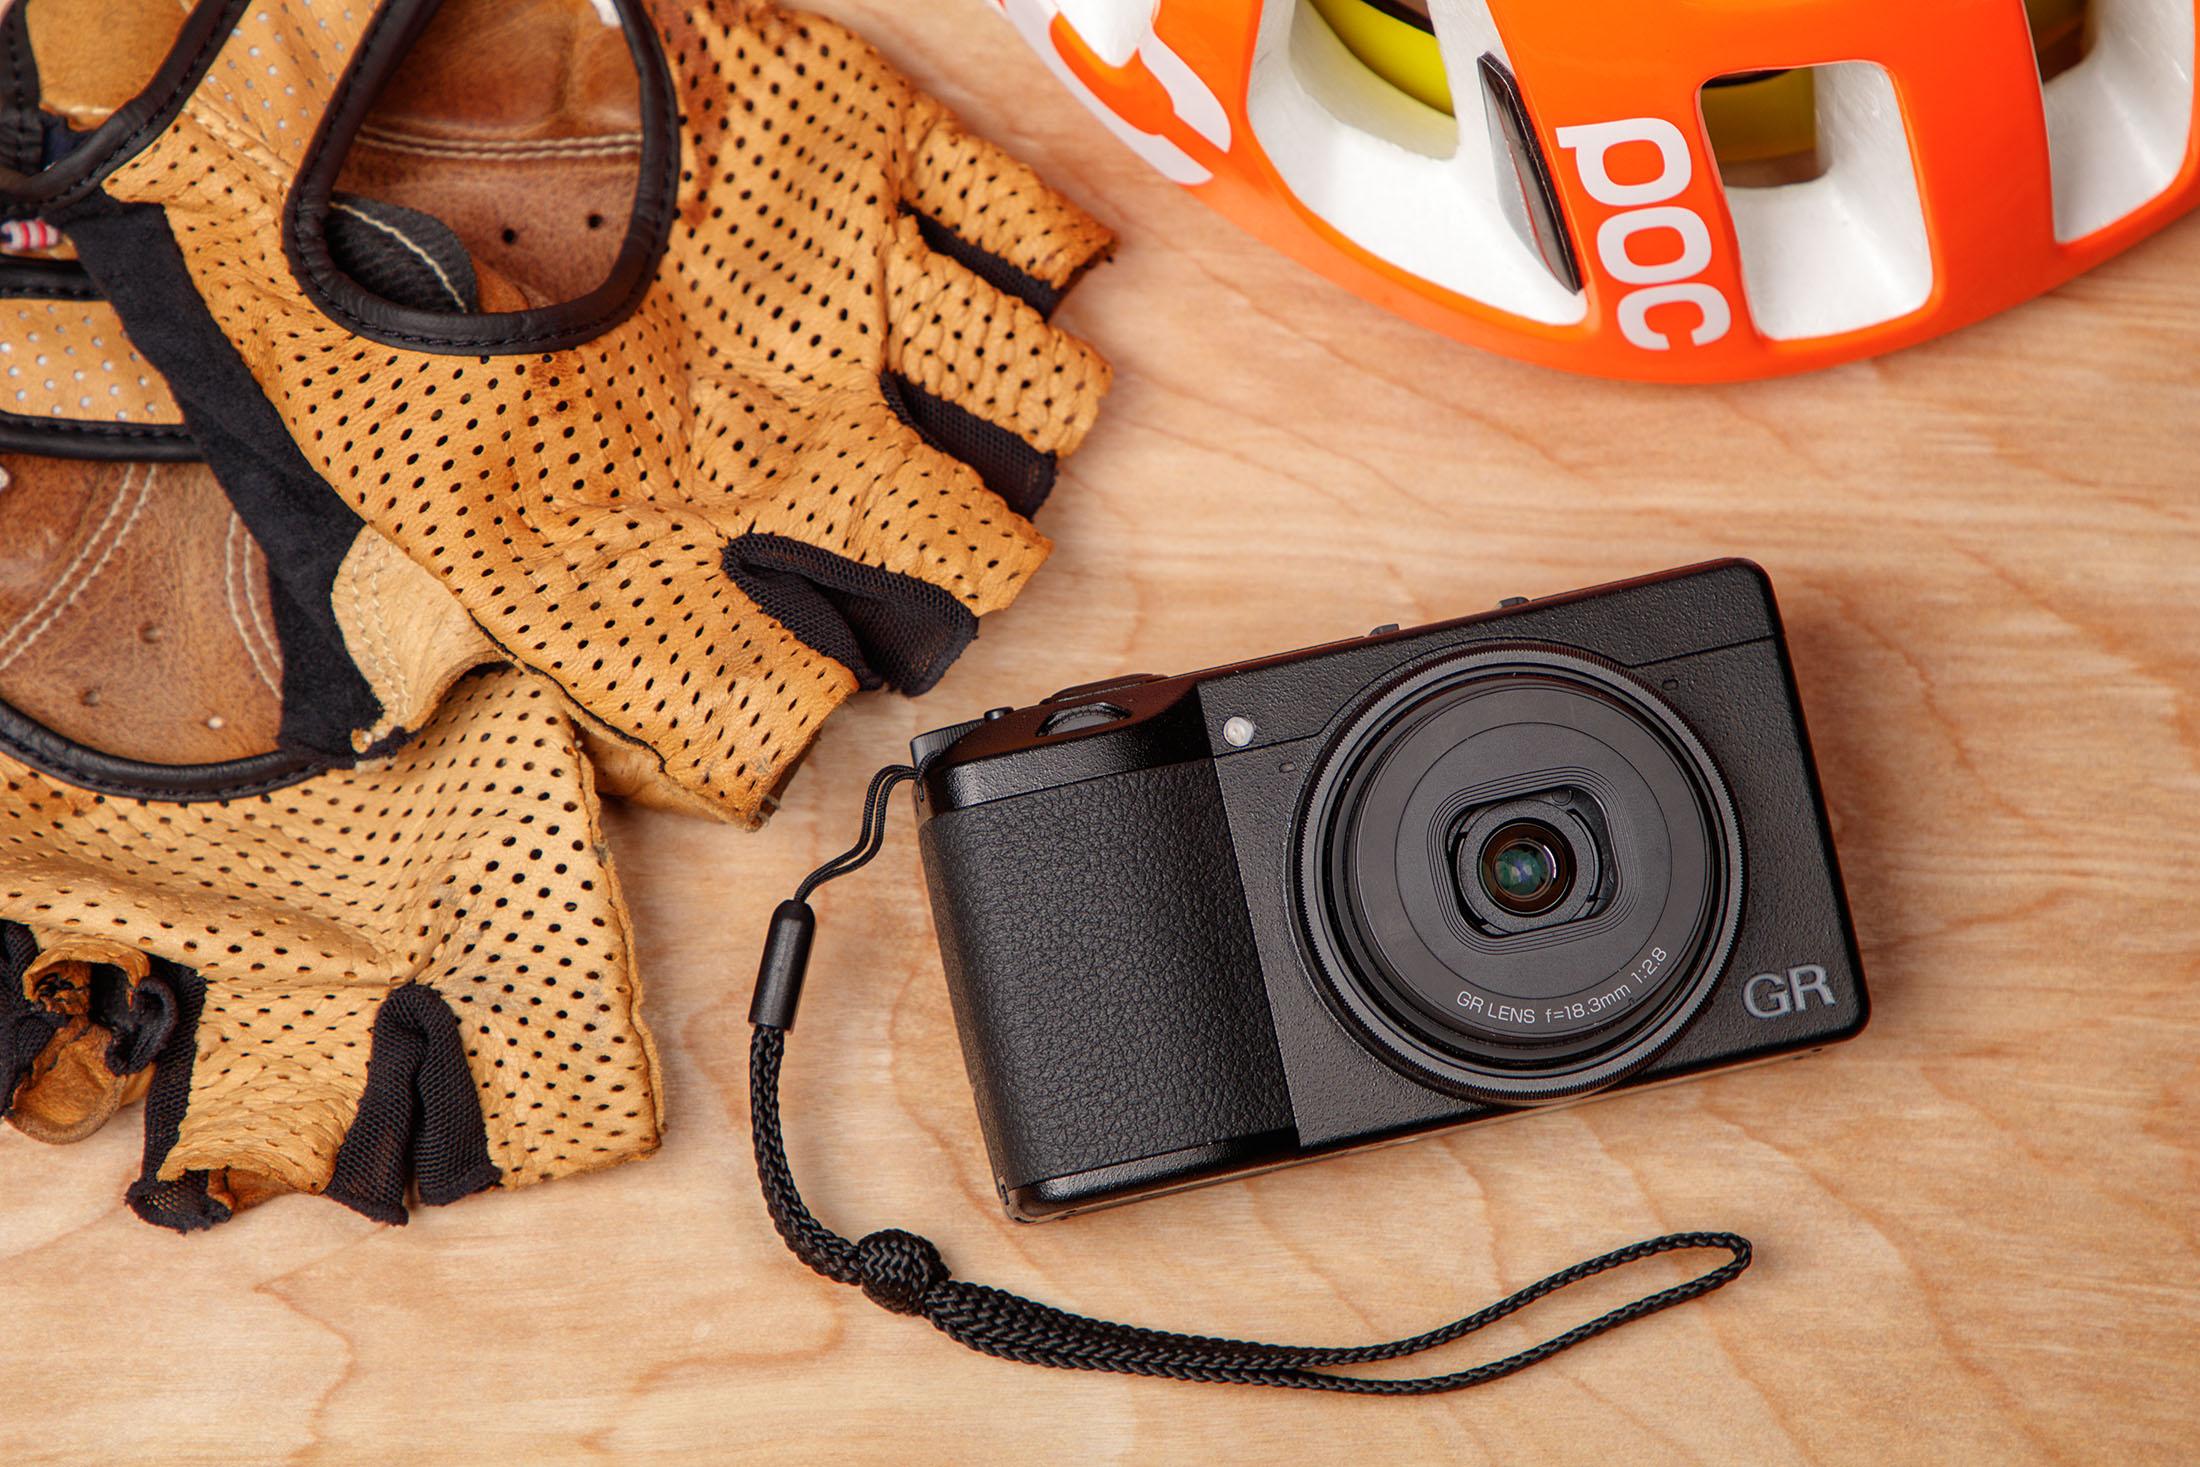 Ricoh GR III shooting experience: